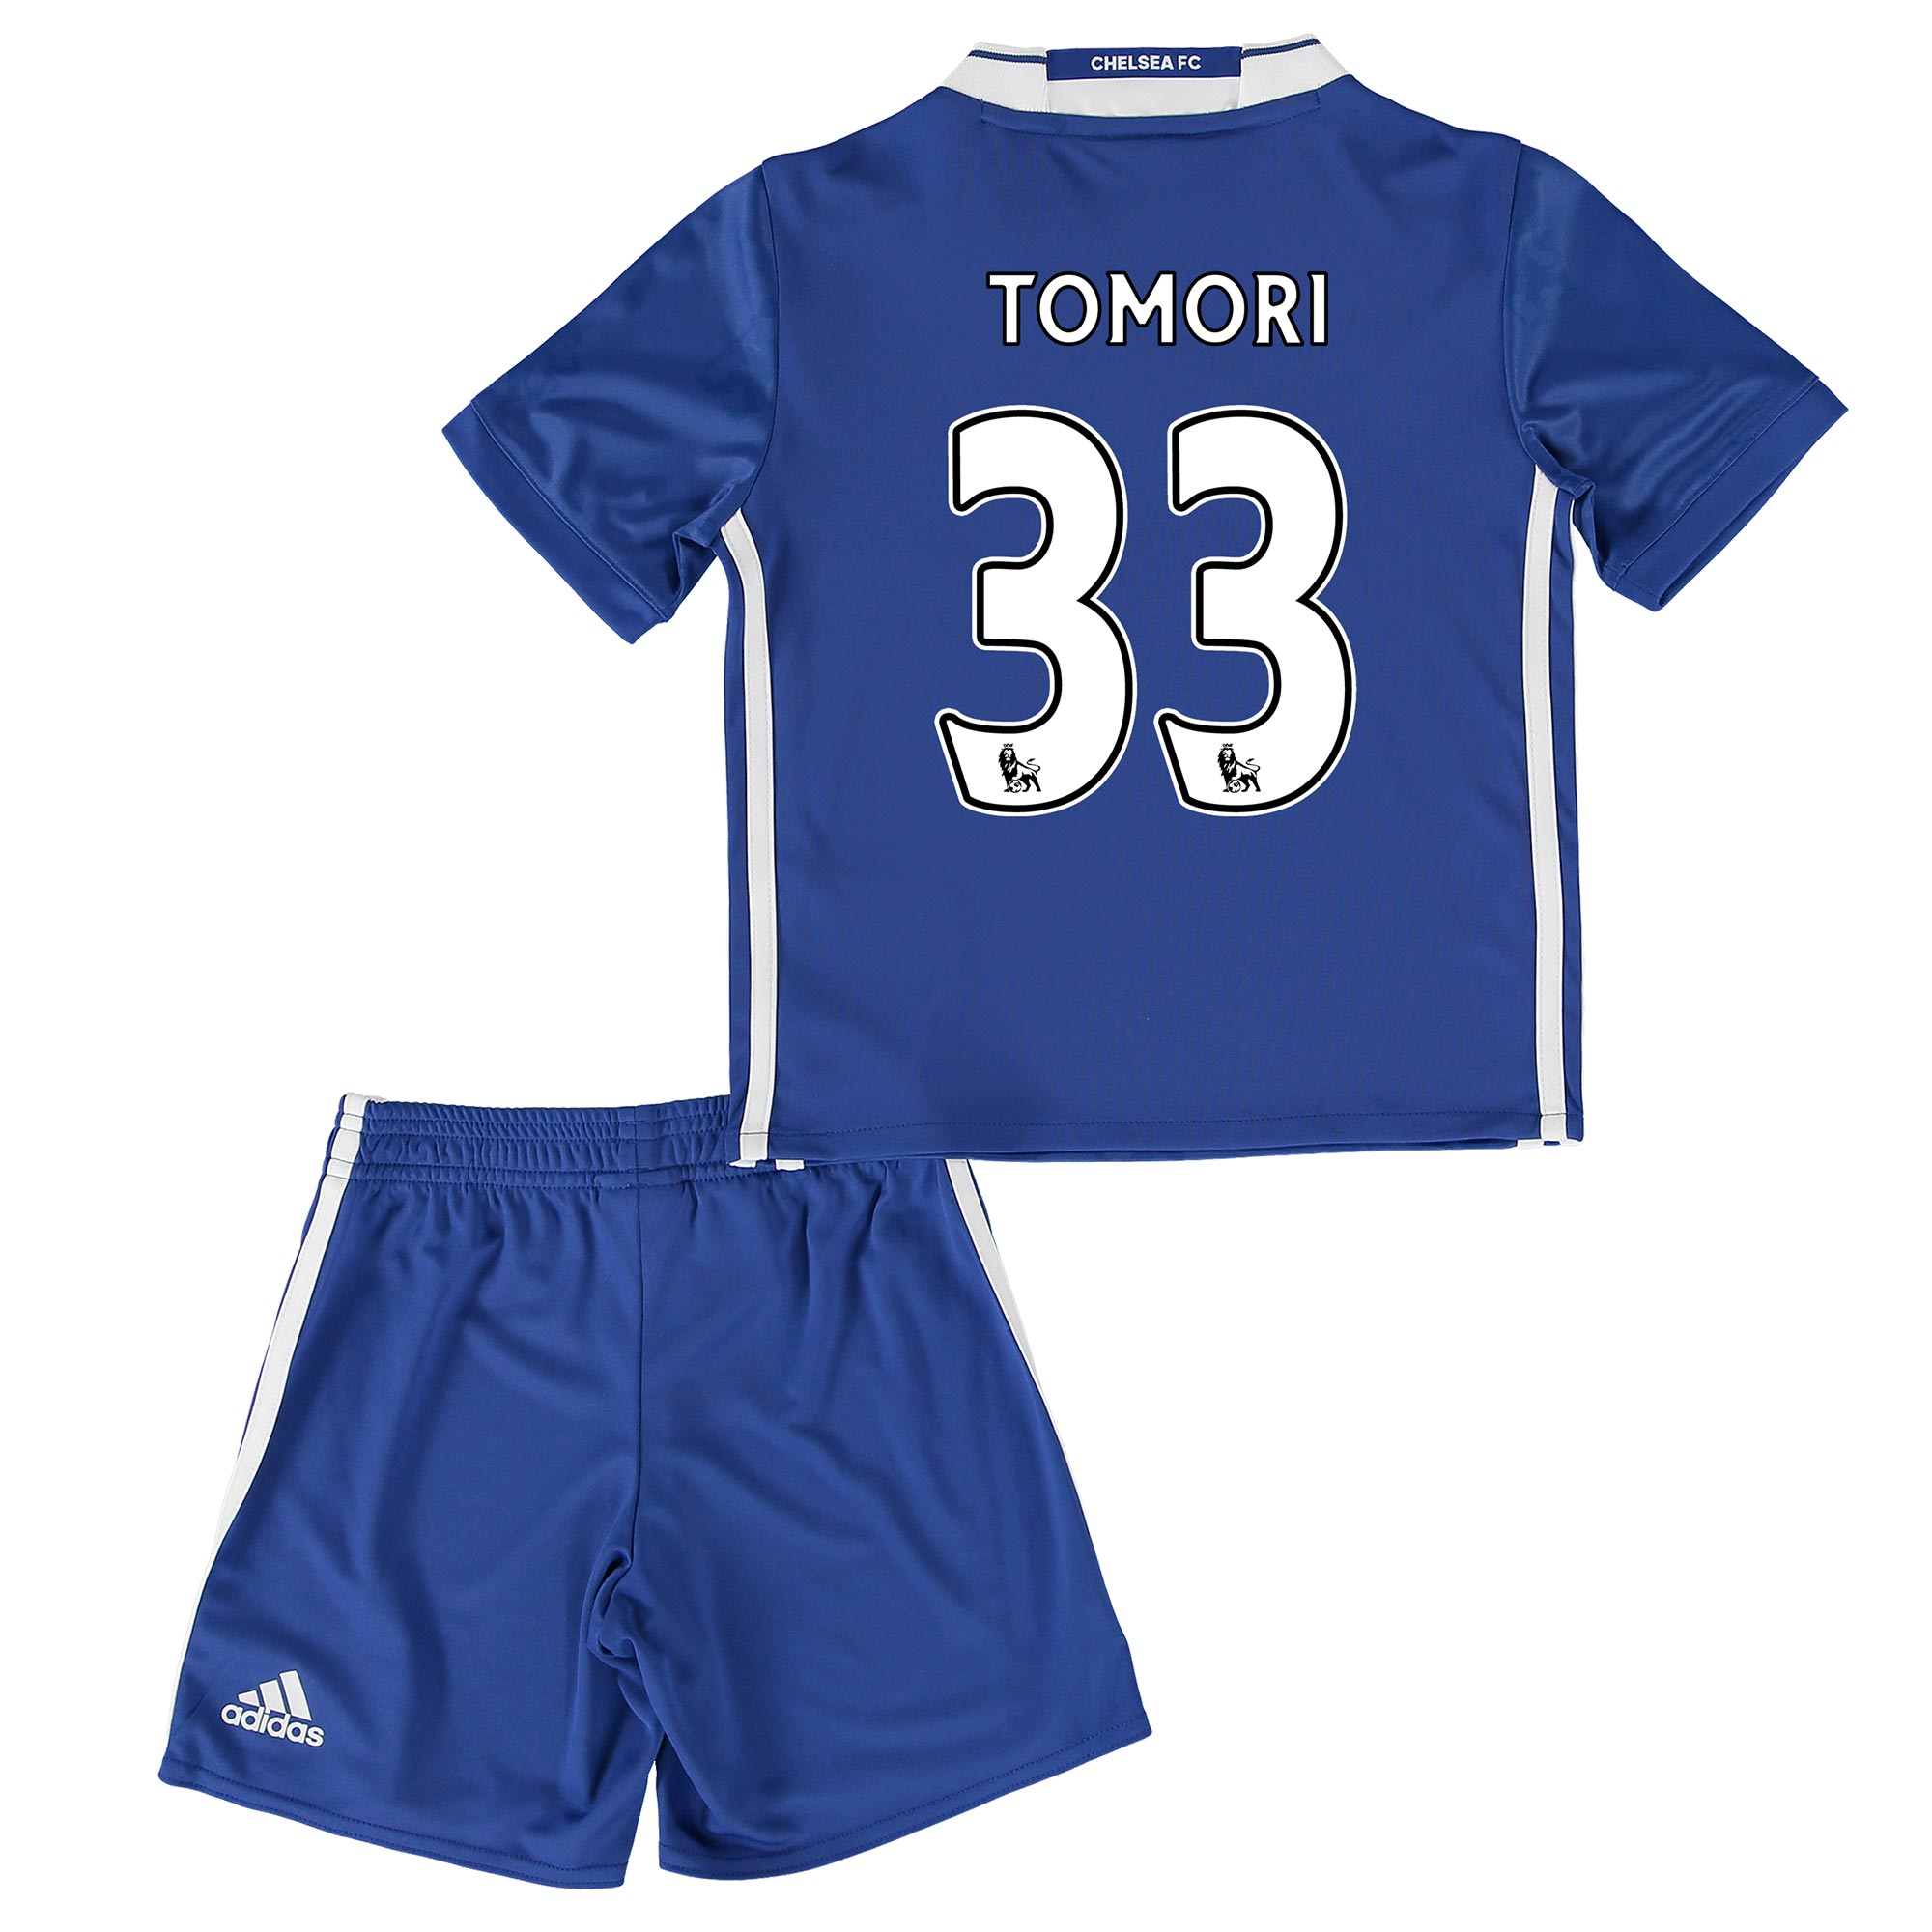 Chelsea Home Mini Kit 2016-17 with Tomori 33 printing